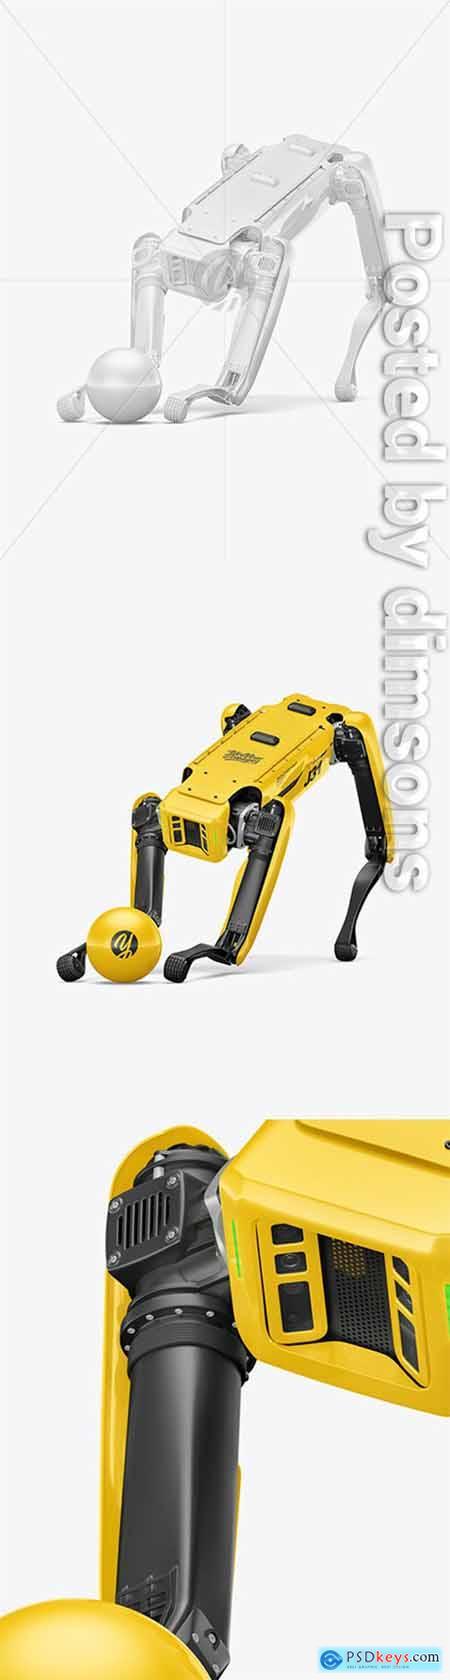 Four-Legged Robot with Ball Mockup 66320